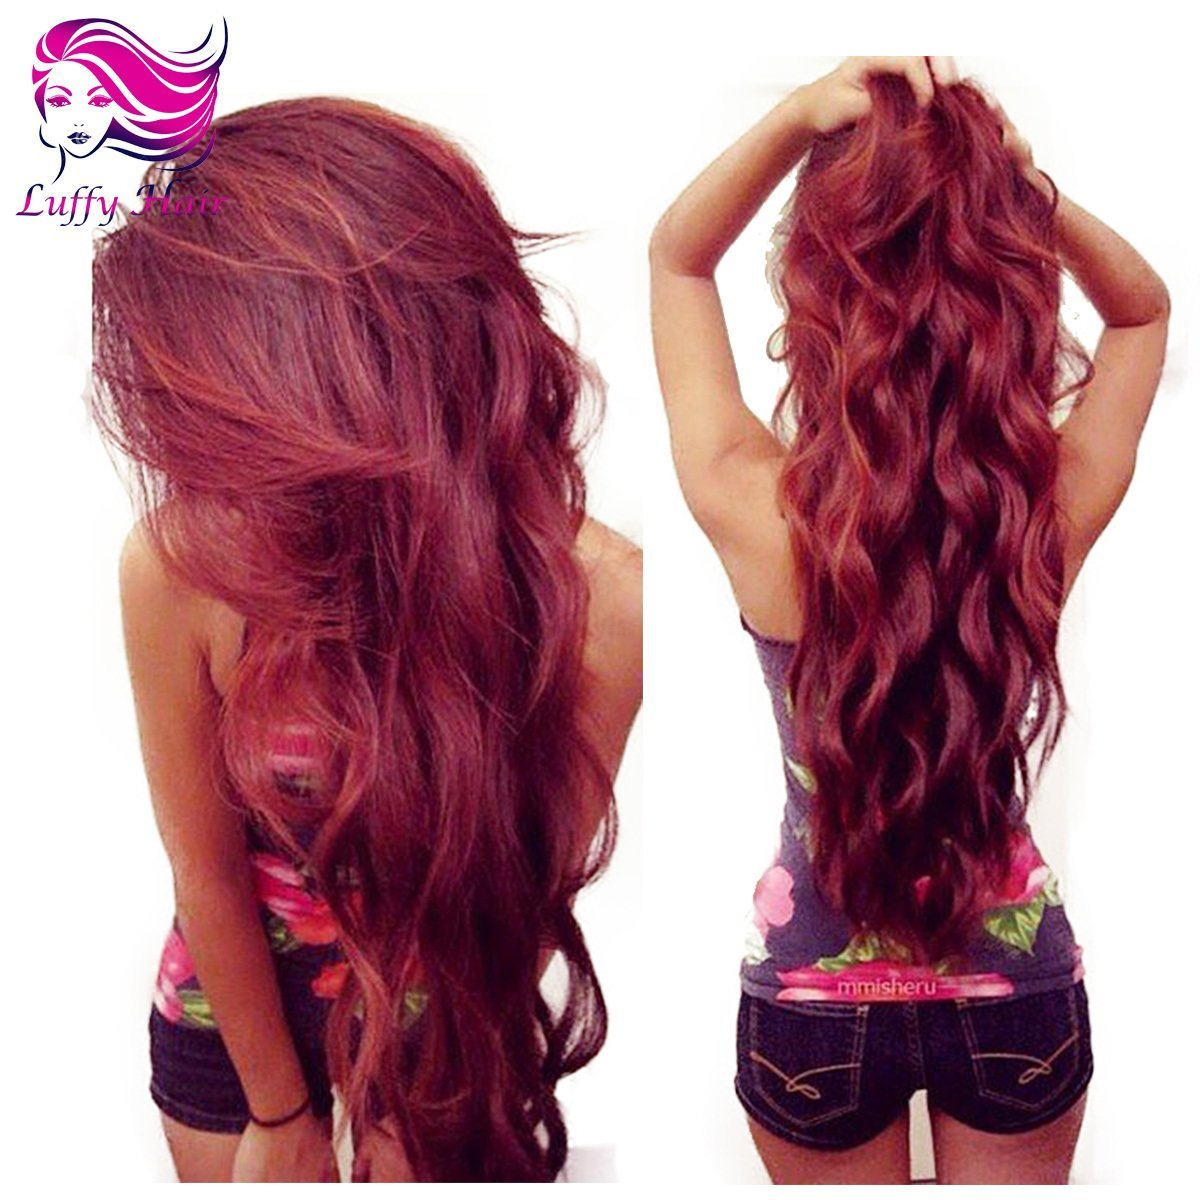 10A Virgin Human Hair Burgundy Body Wave Wig - KWL006